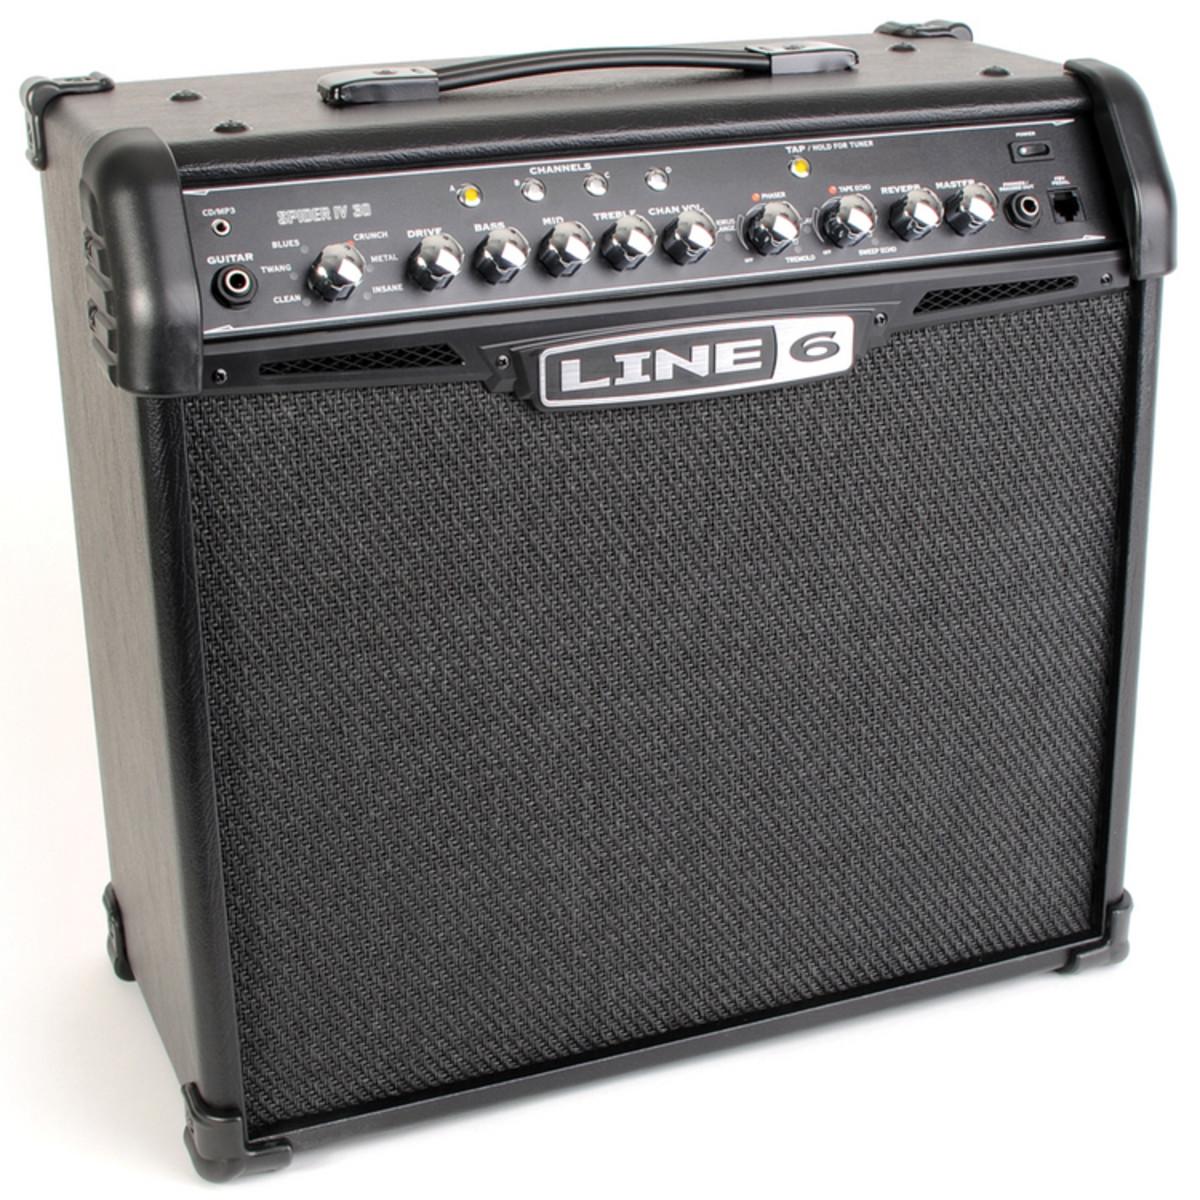 line 6 spider iv 30 guitar combo amp b stock at gear4music. Black Bedroom Furniture Sets. Home Design Ideas